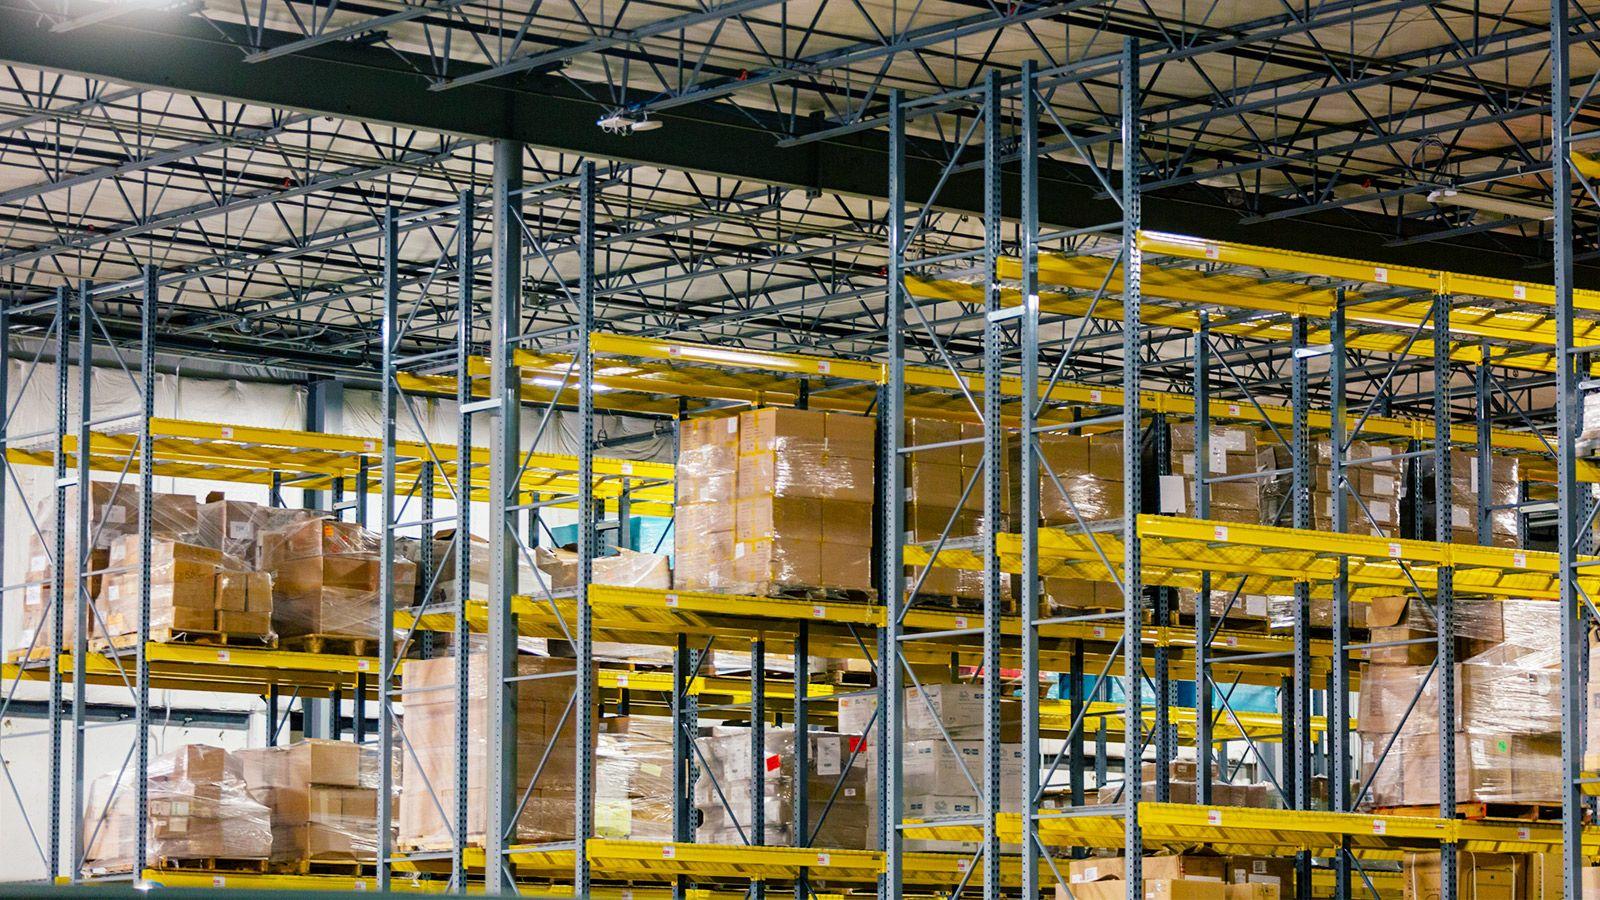 B2B and B2C Warehouses Explained